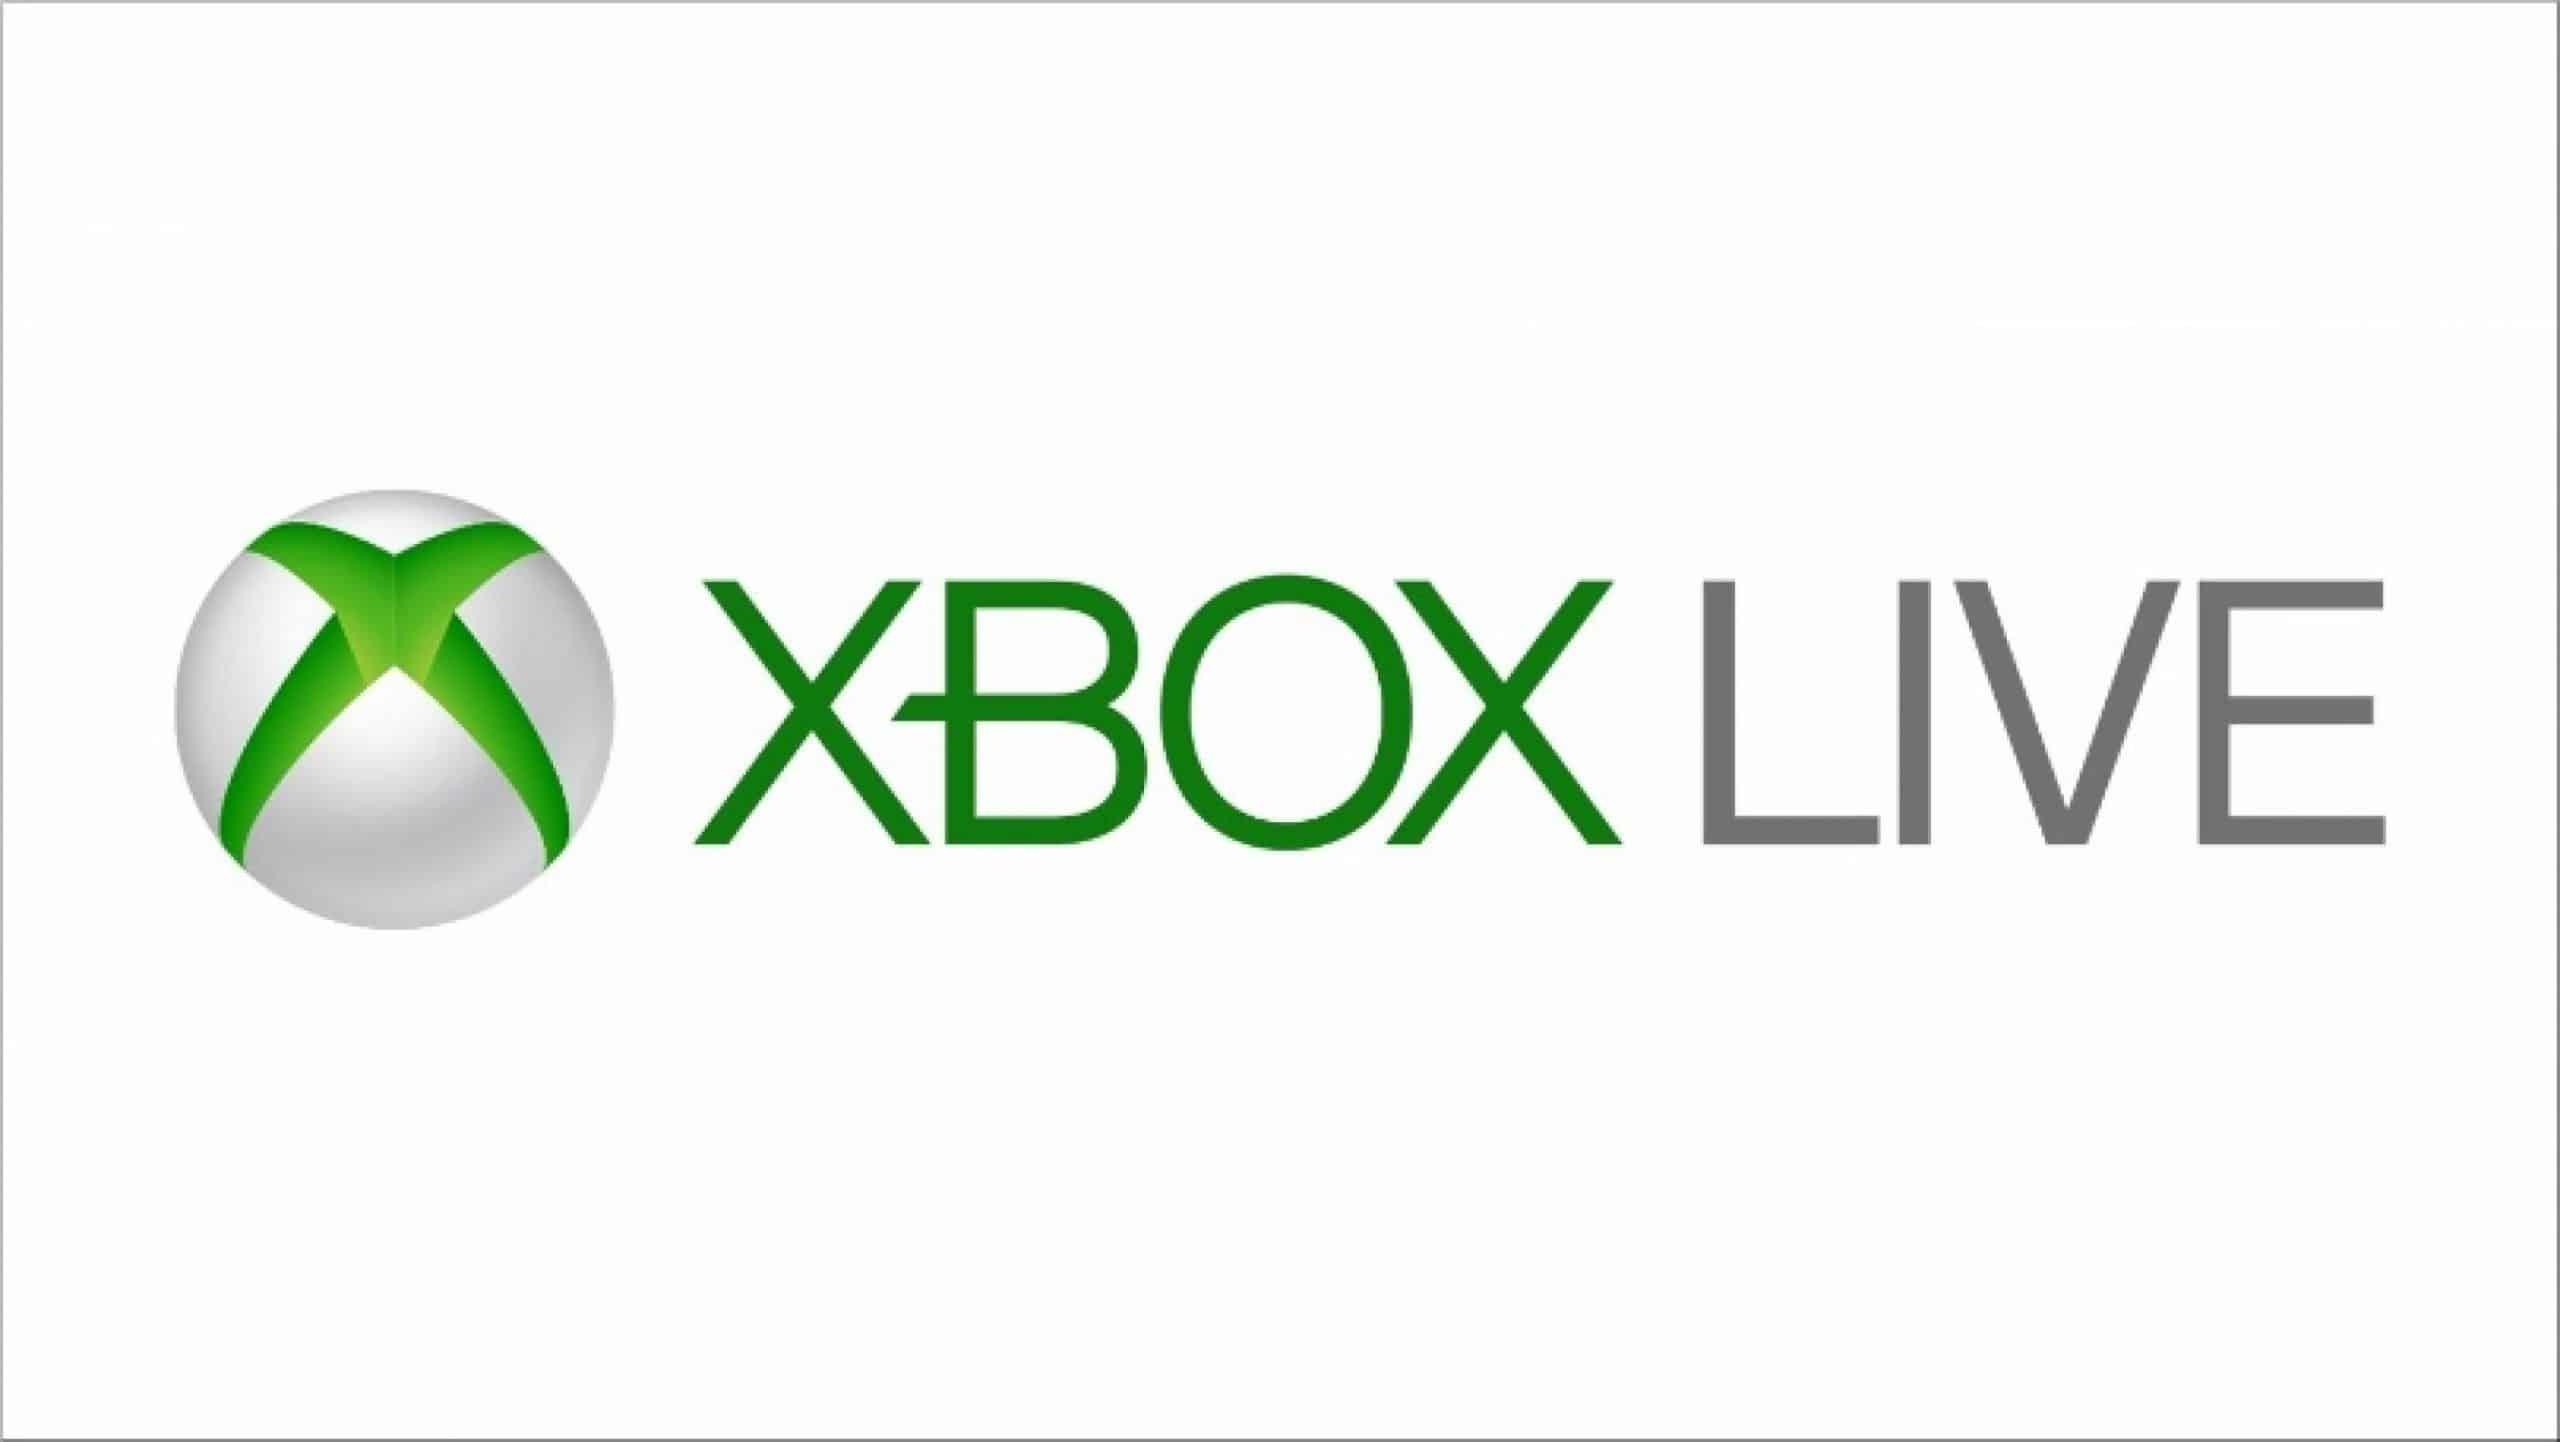 Cancel Xbox Live Subscription